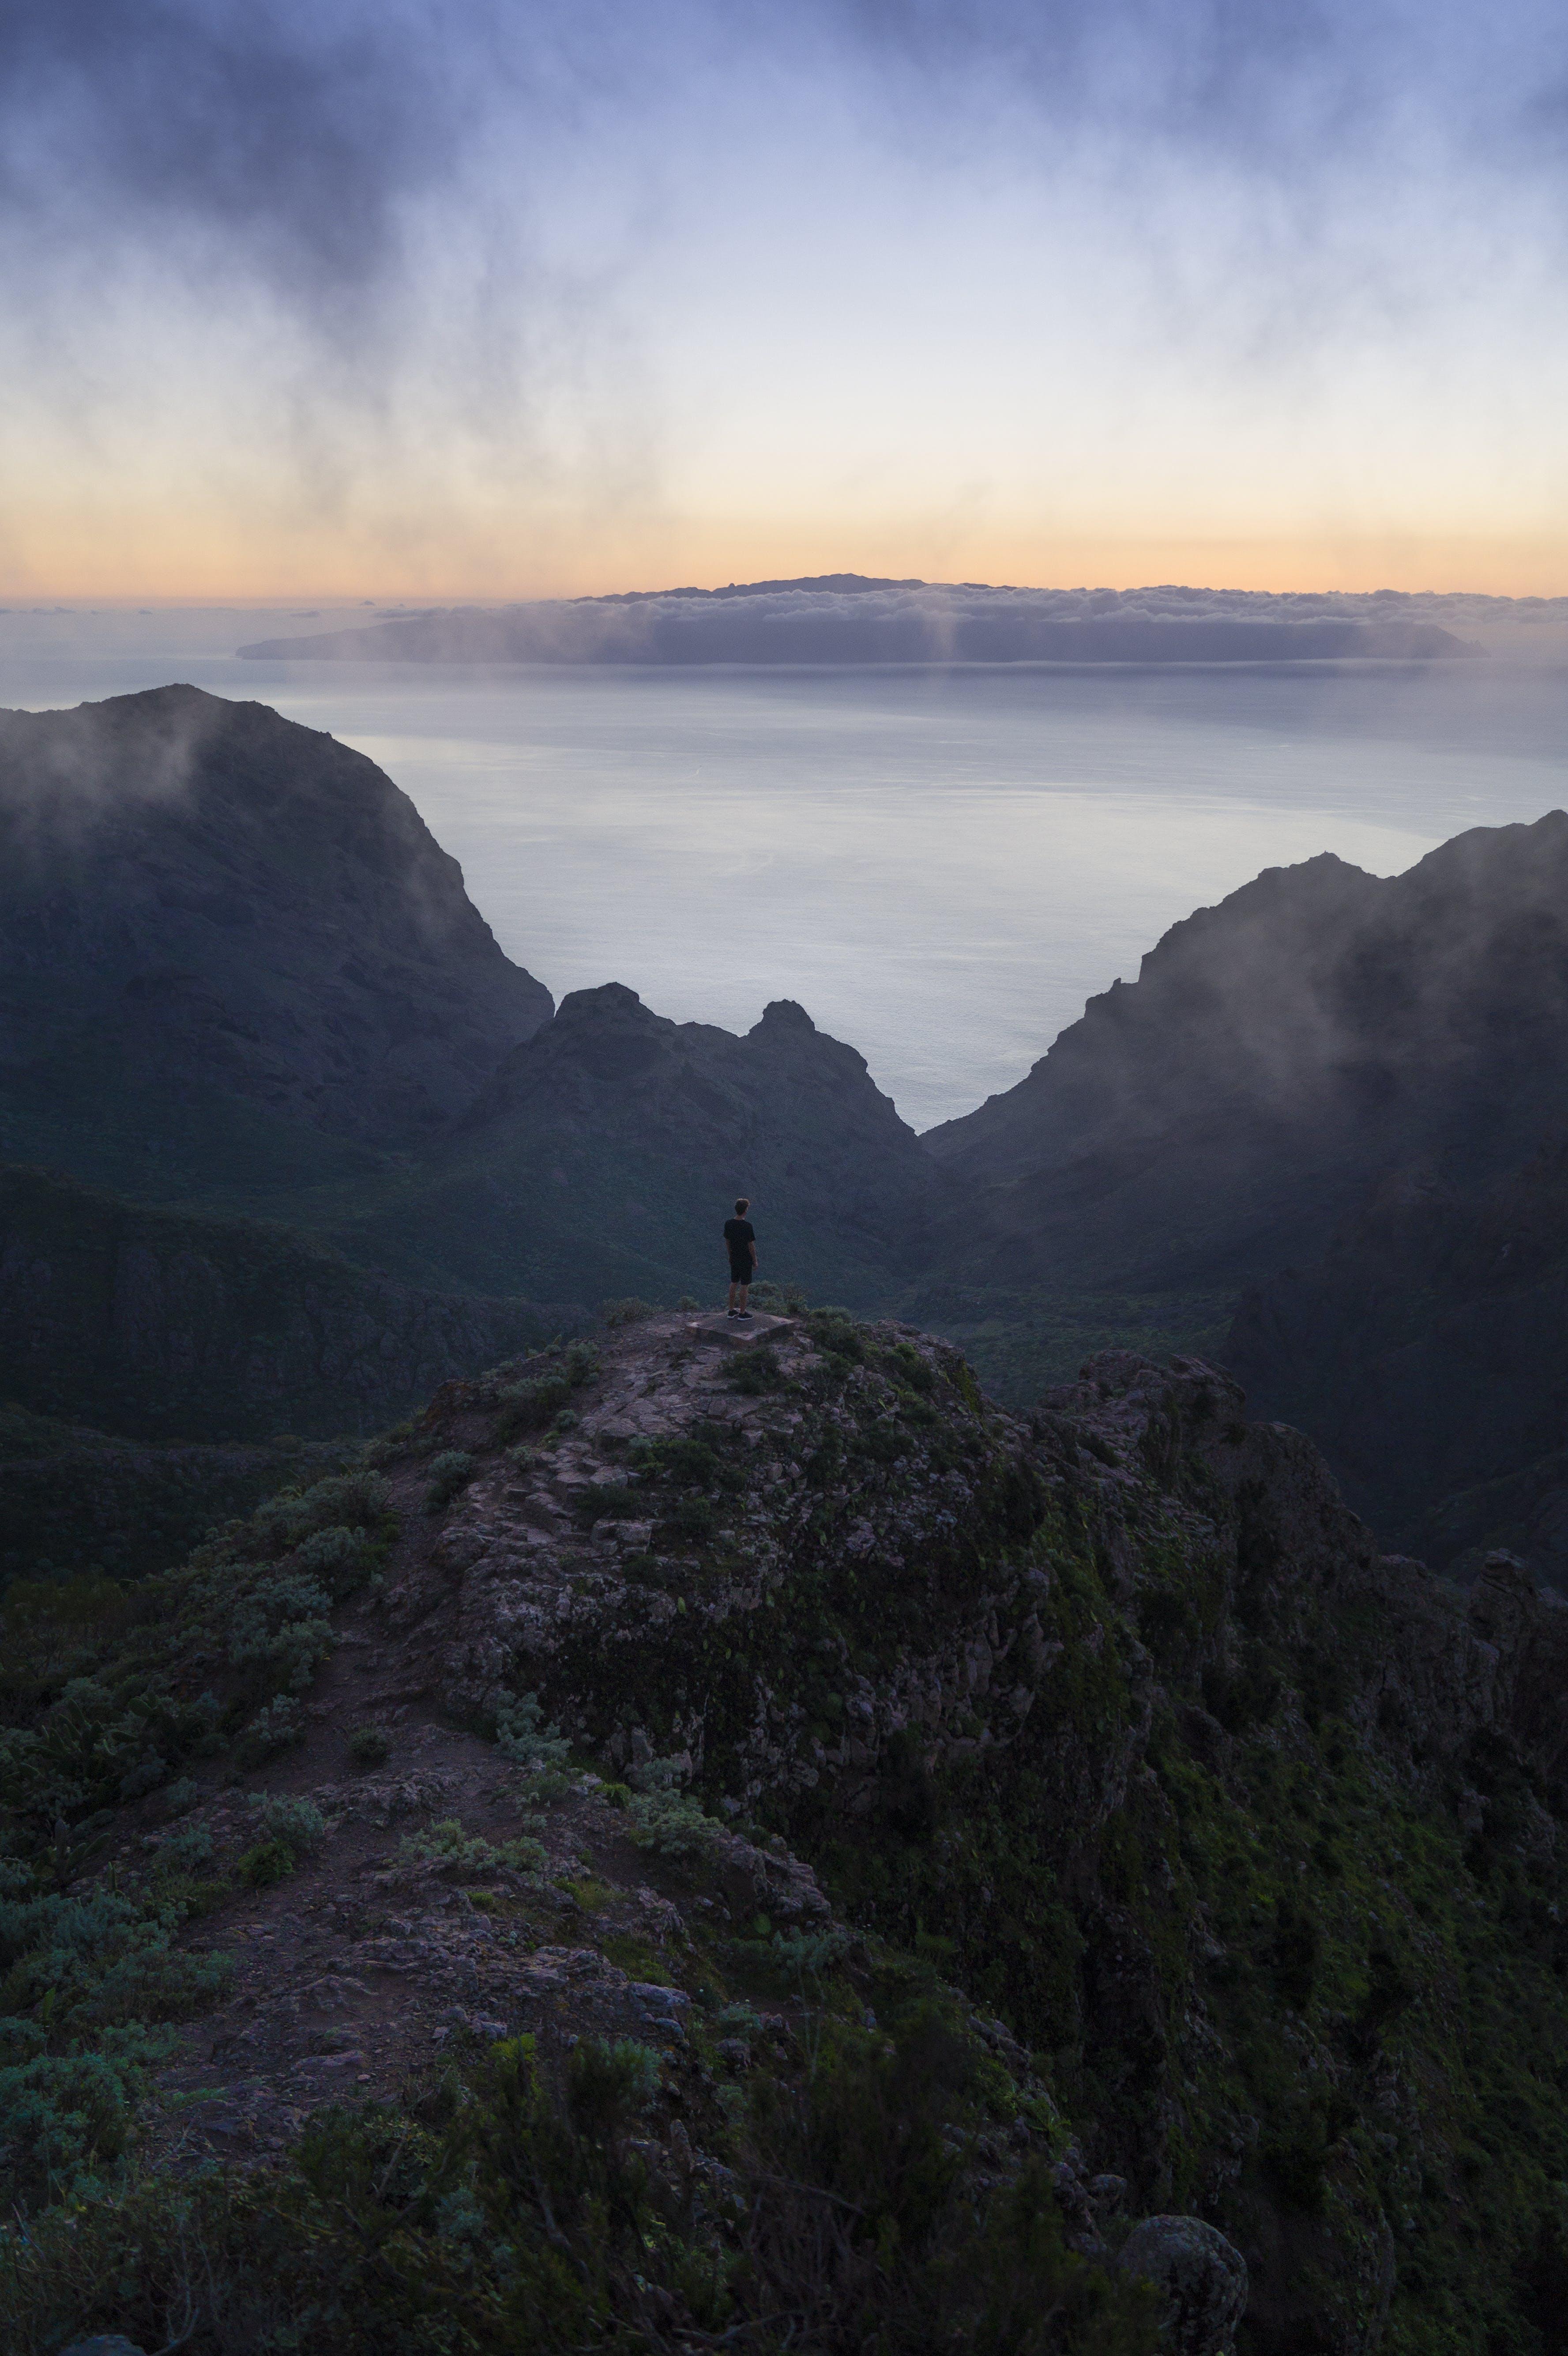 Free stock photo of mountains, nature, hiking, travel